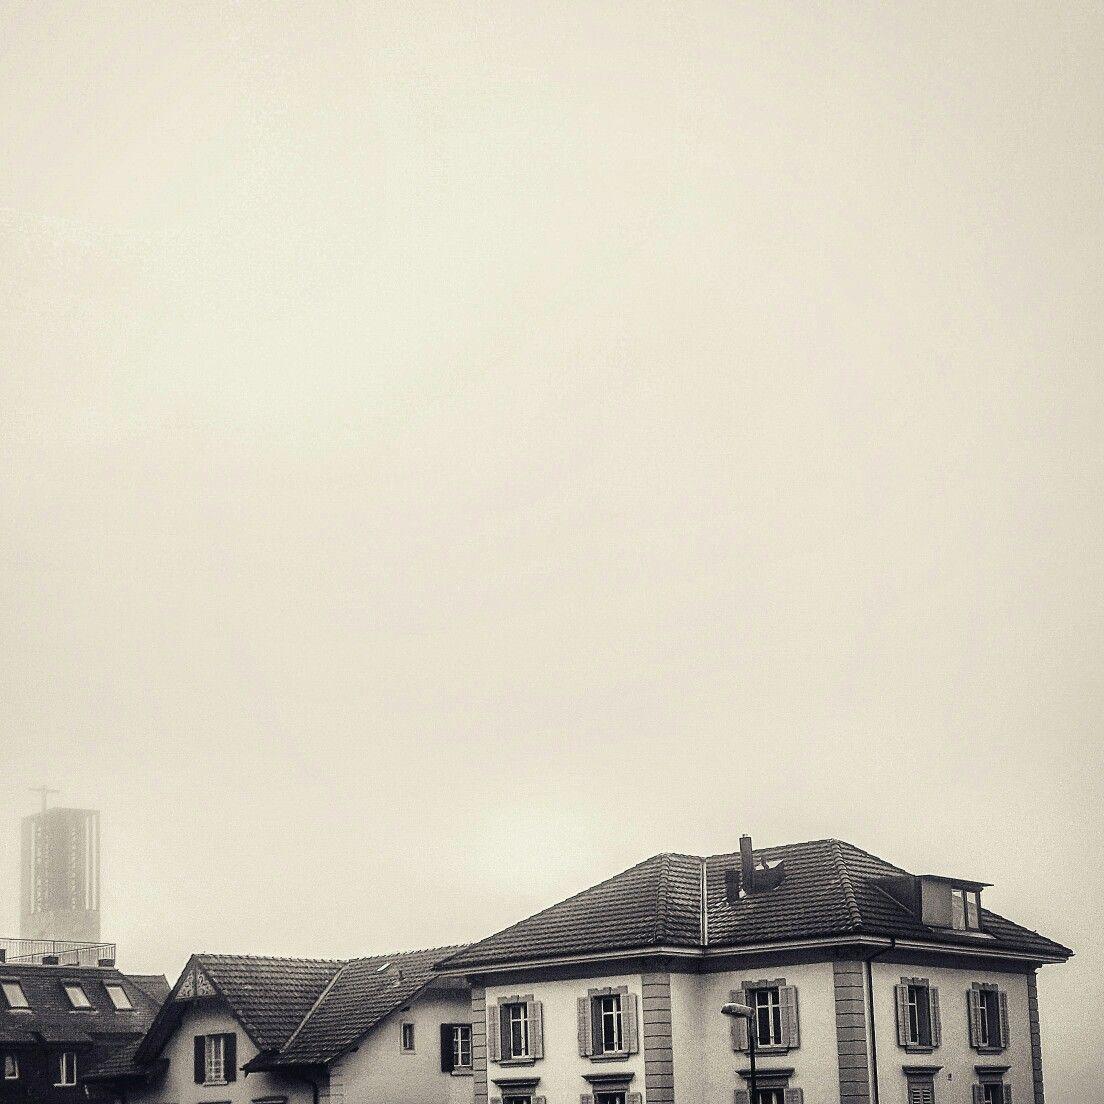 Haze Stuckikommunikation Smartphonefotos Fotografie Und Luzern